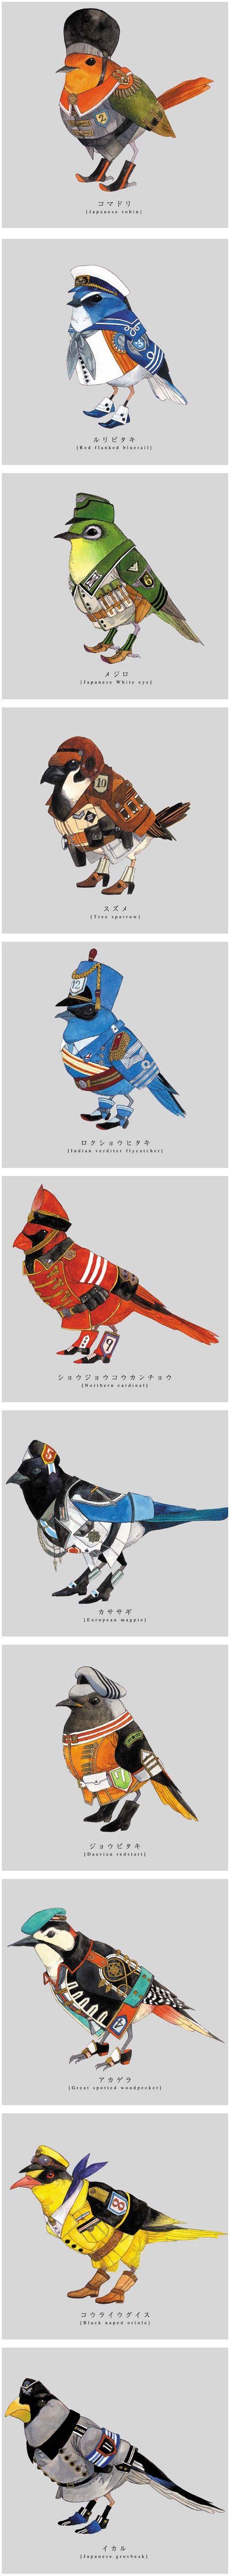 """Torigun"", birds dressed in military uniforms by Japanese artist Sato."